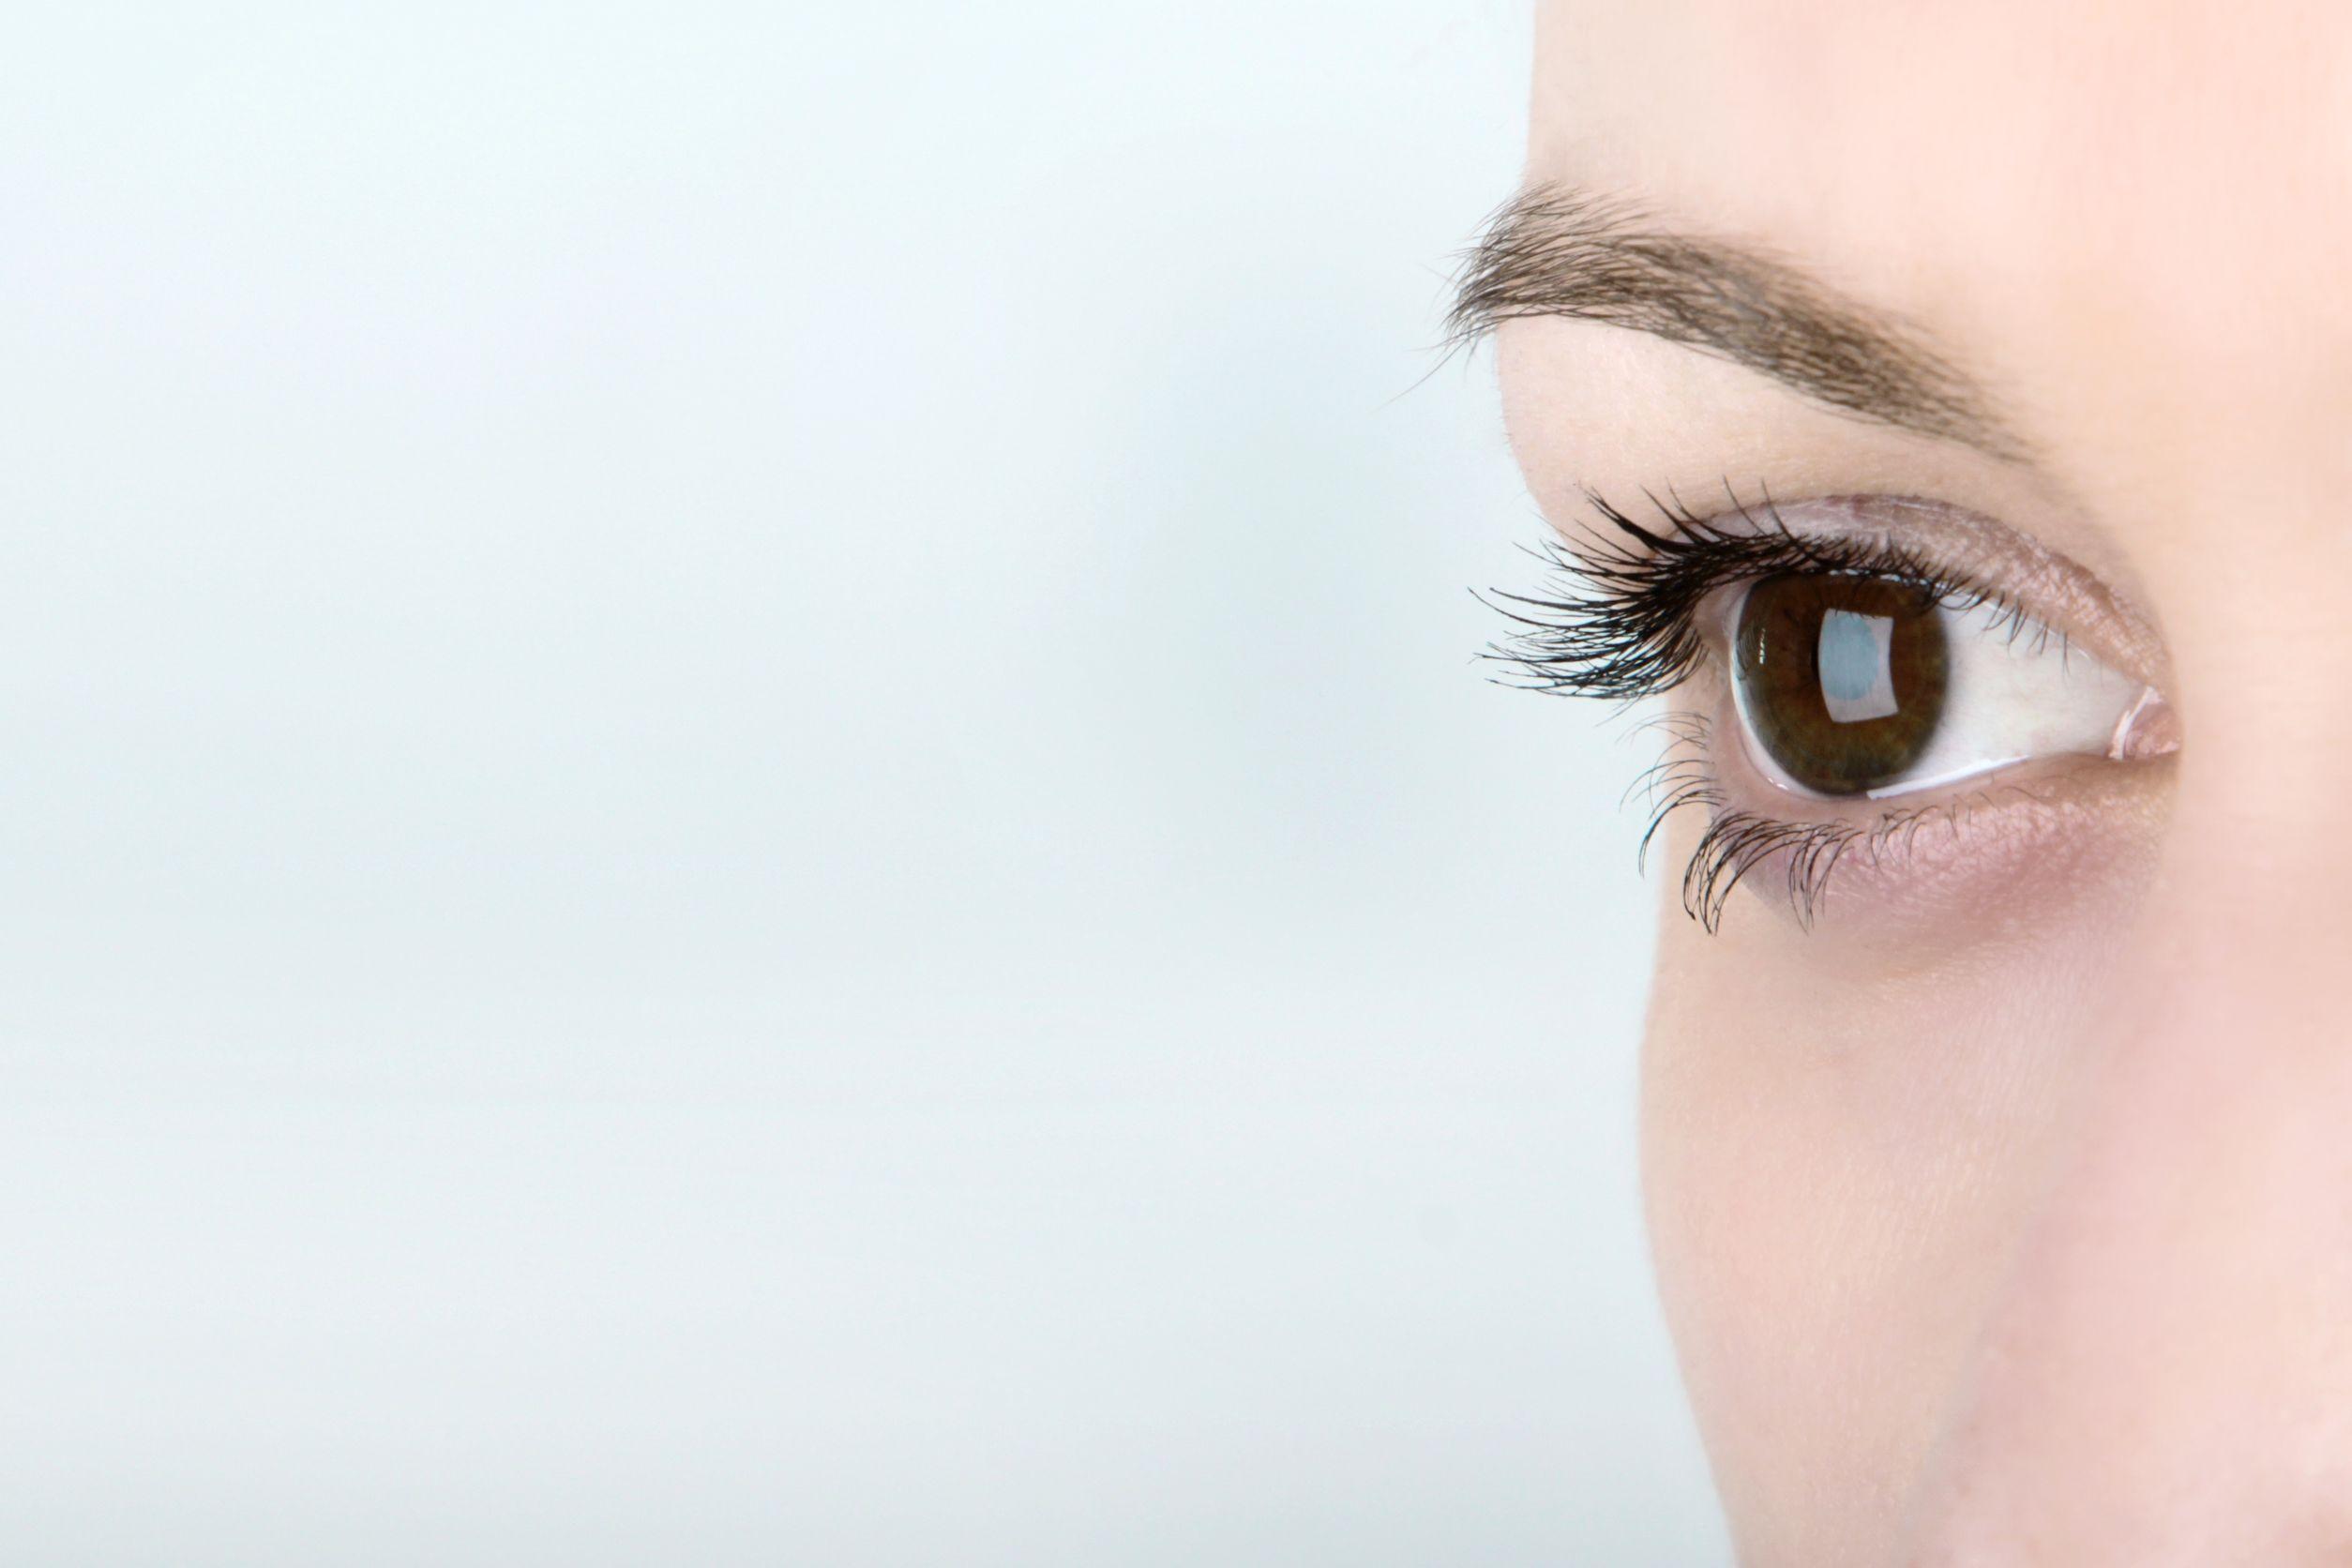 Chirurgie refractive Maroc